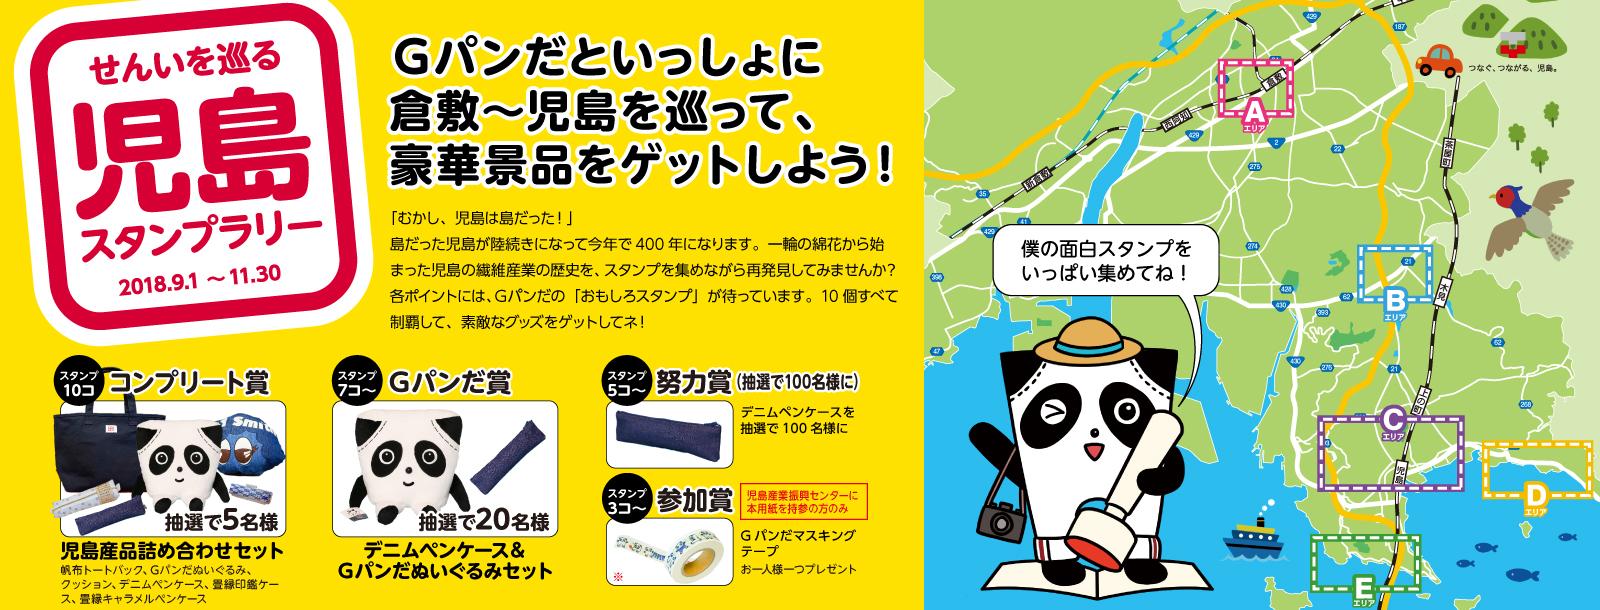 banner(ホームページ用)